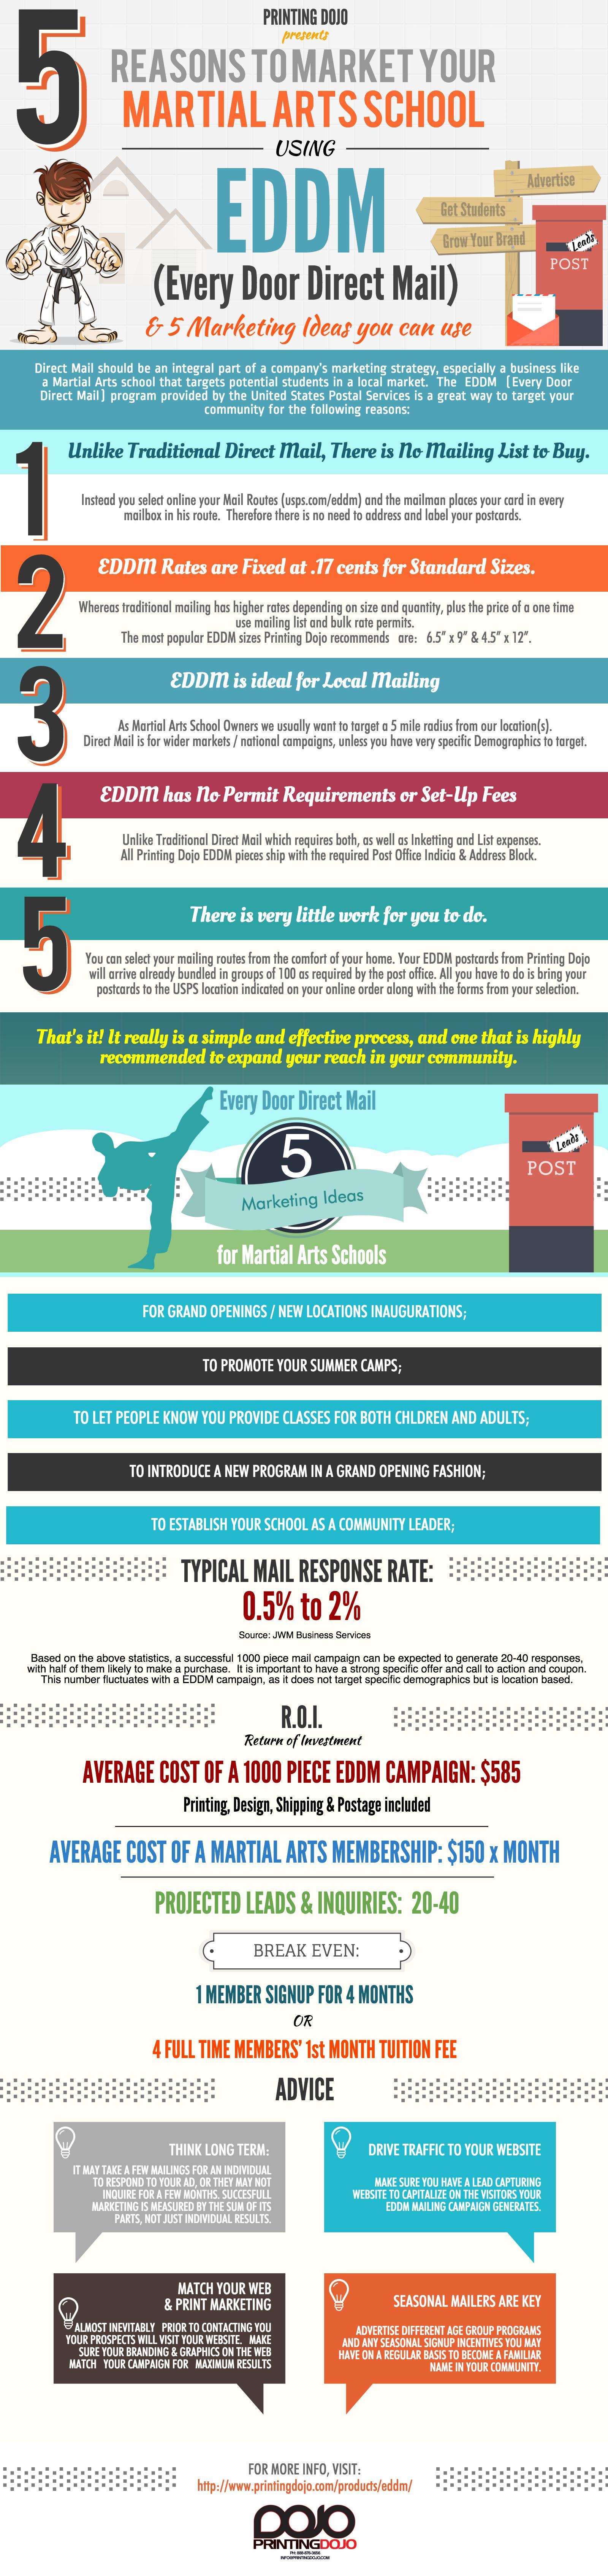 EDDM Infographic